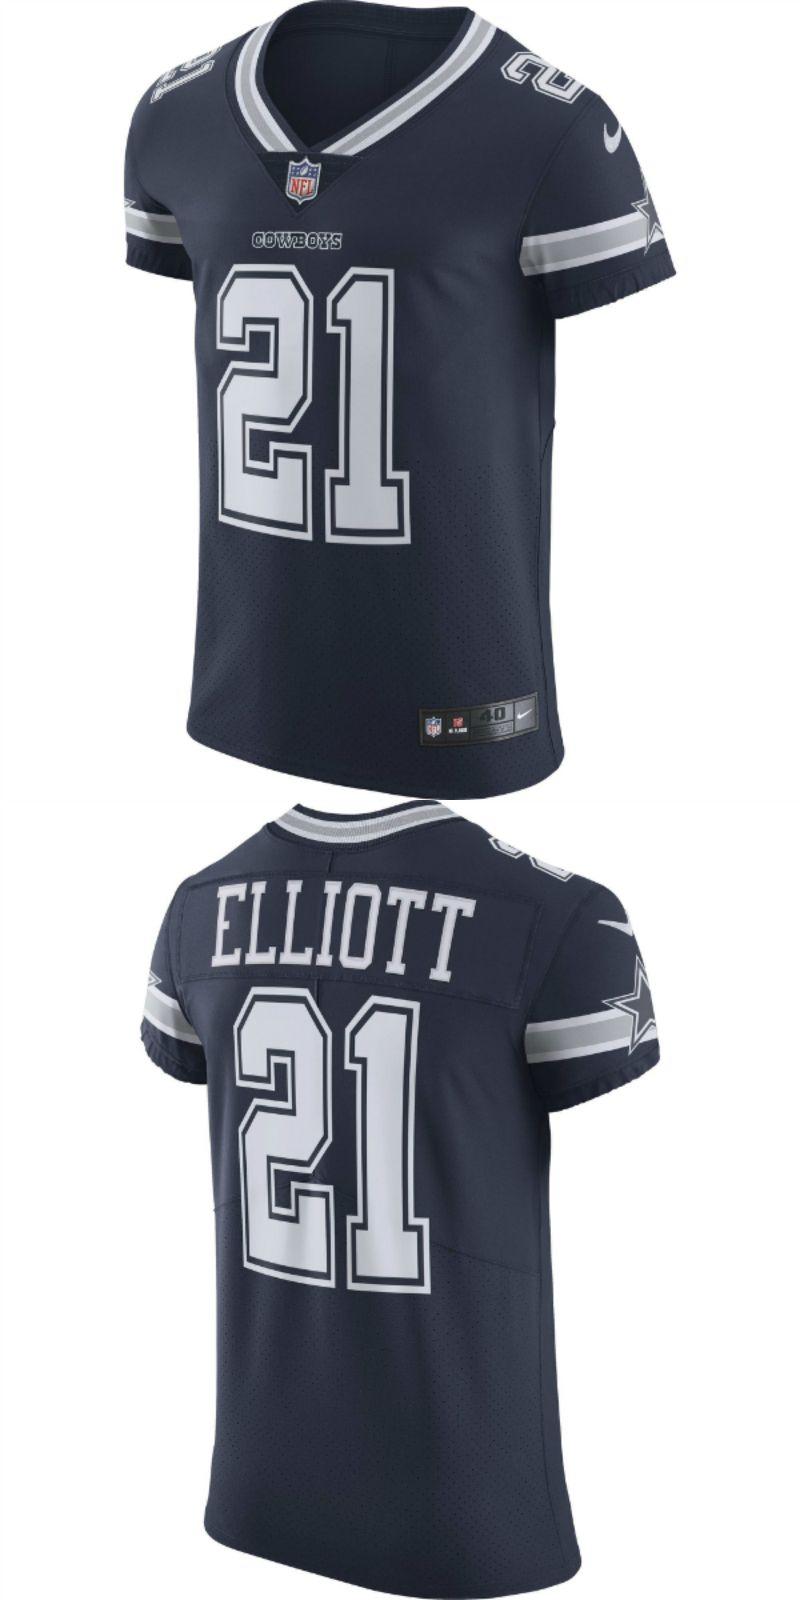 reputable site 7aca5 f9df6 UP TO 70% OFF. Ezekiel Elliott Dallas Cowboys Nike Vapor ...